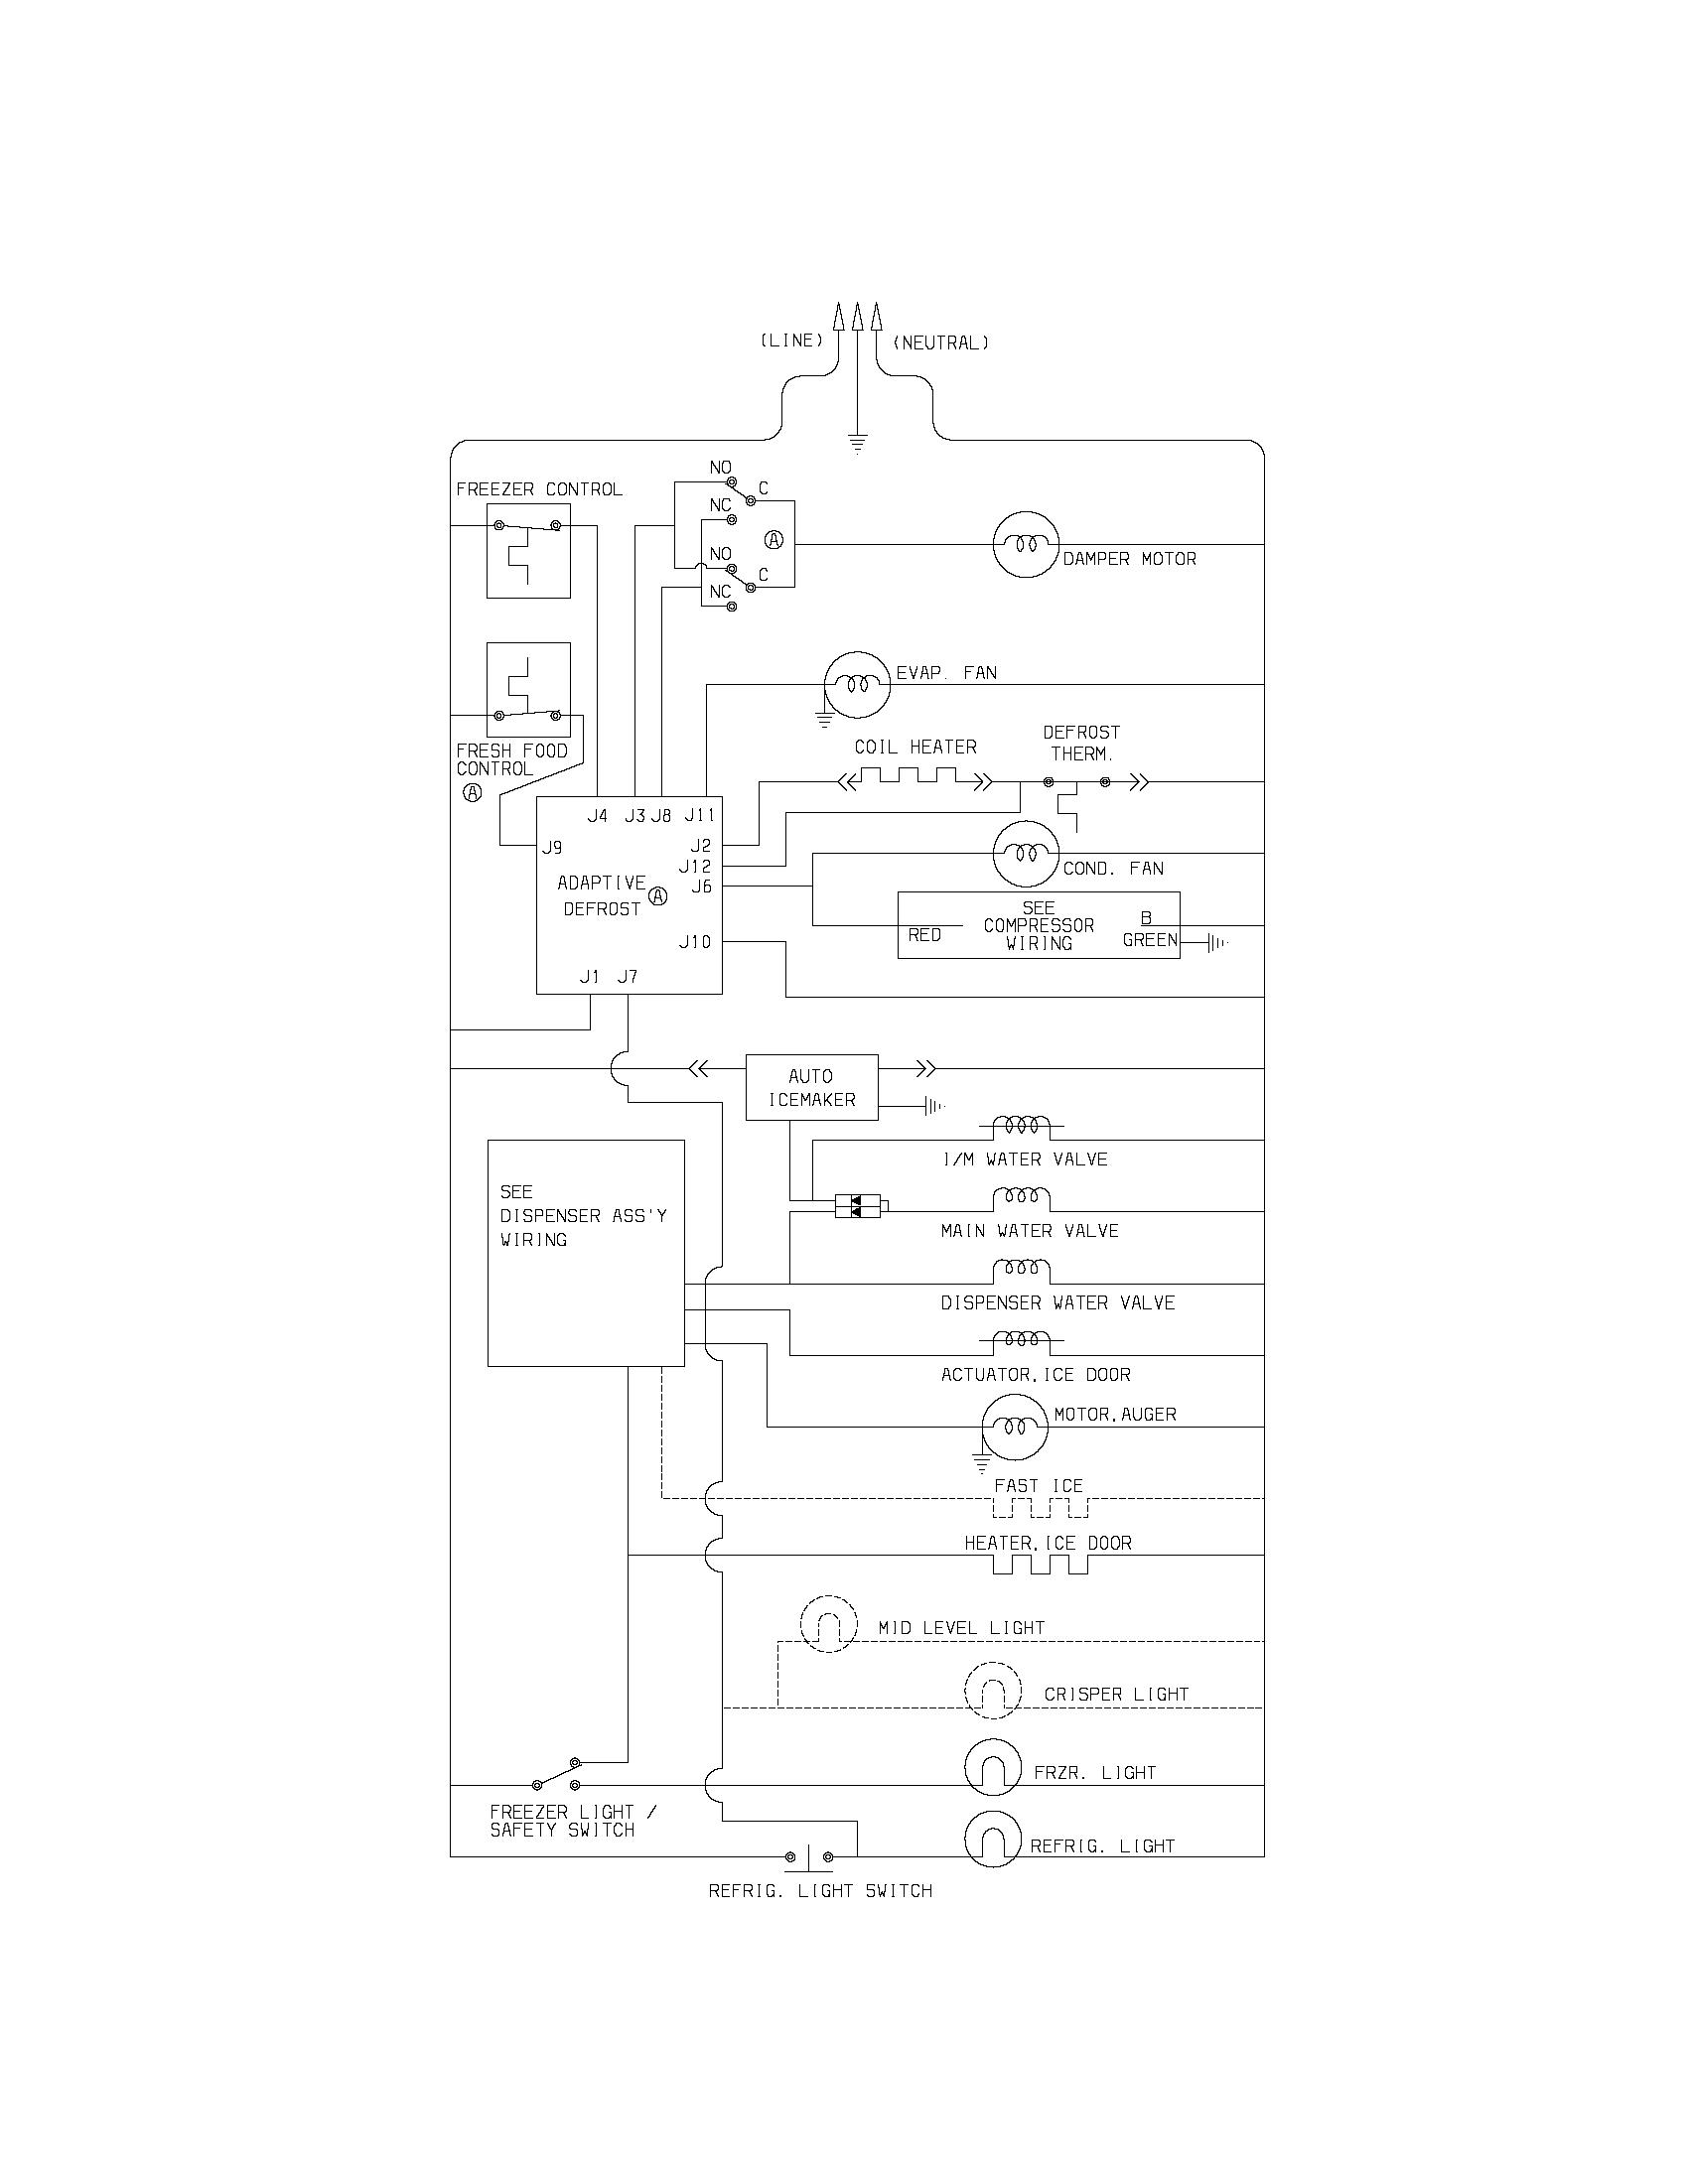 westinghouse electric motor wiring diagram tao atv refrigerator library